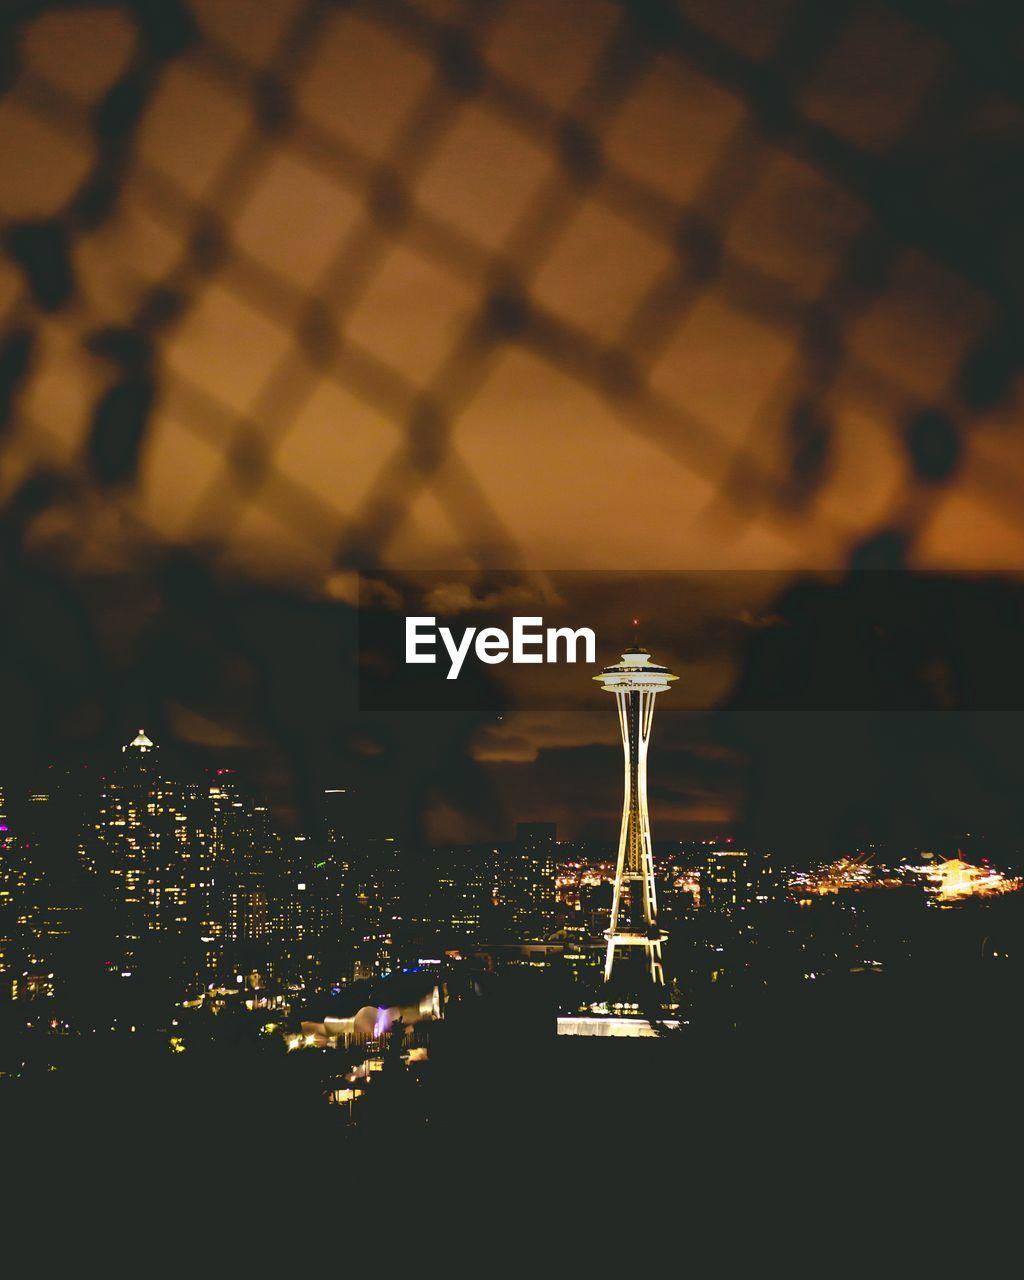 night, illuminated, no people, indoors, cityscape, city, close-up, sky